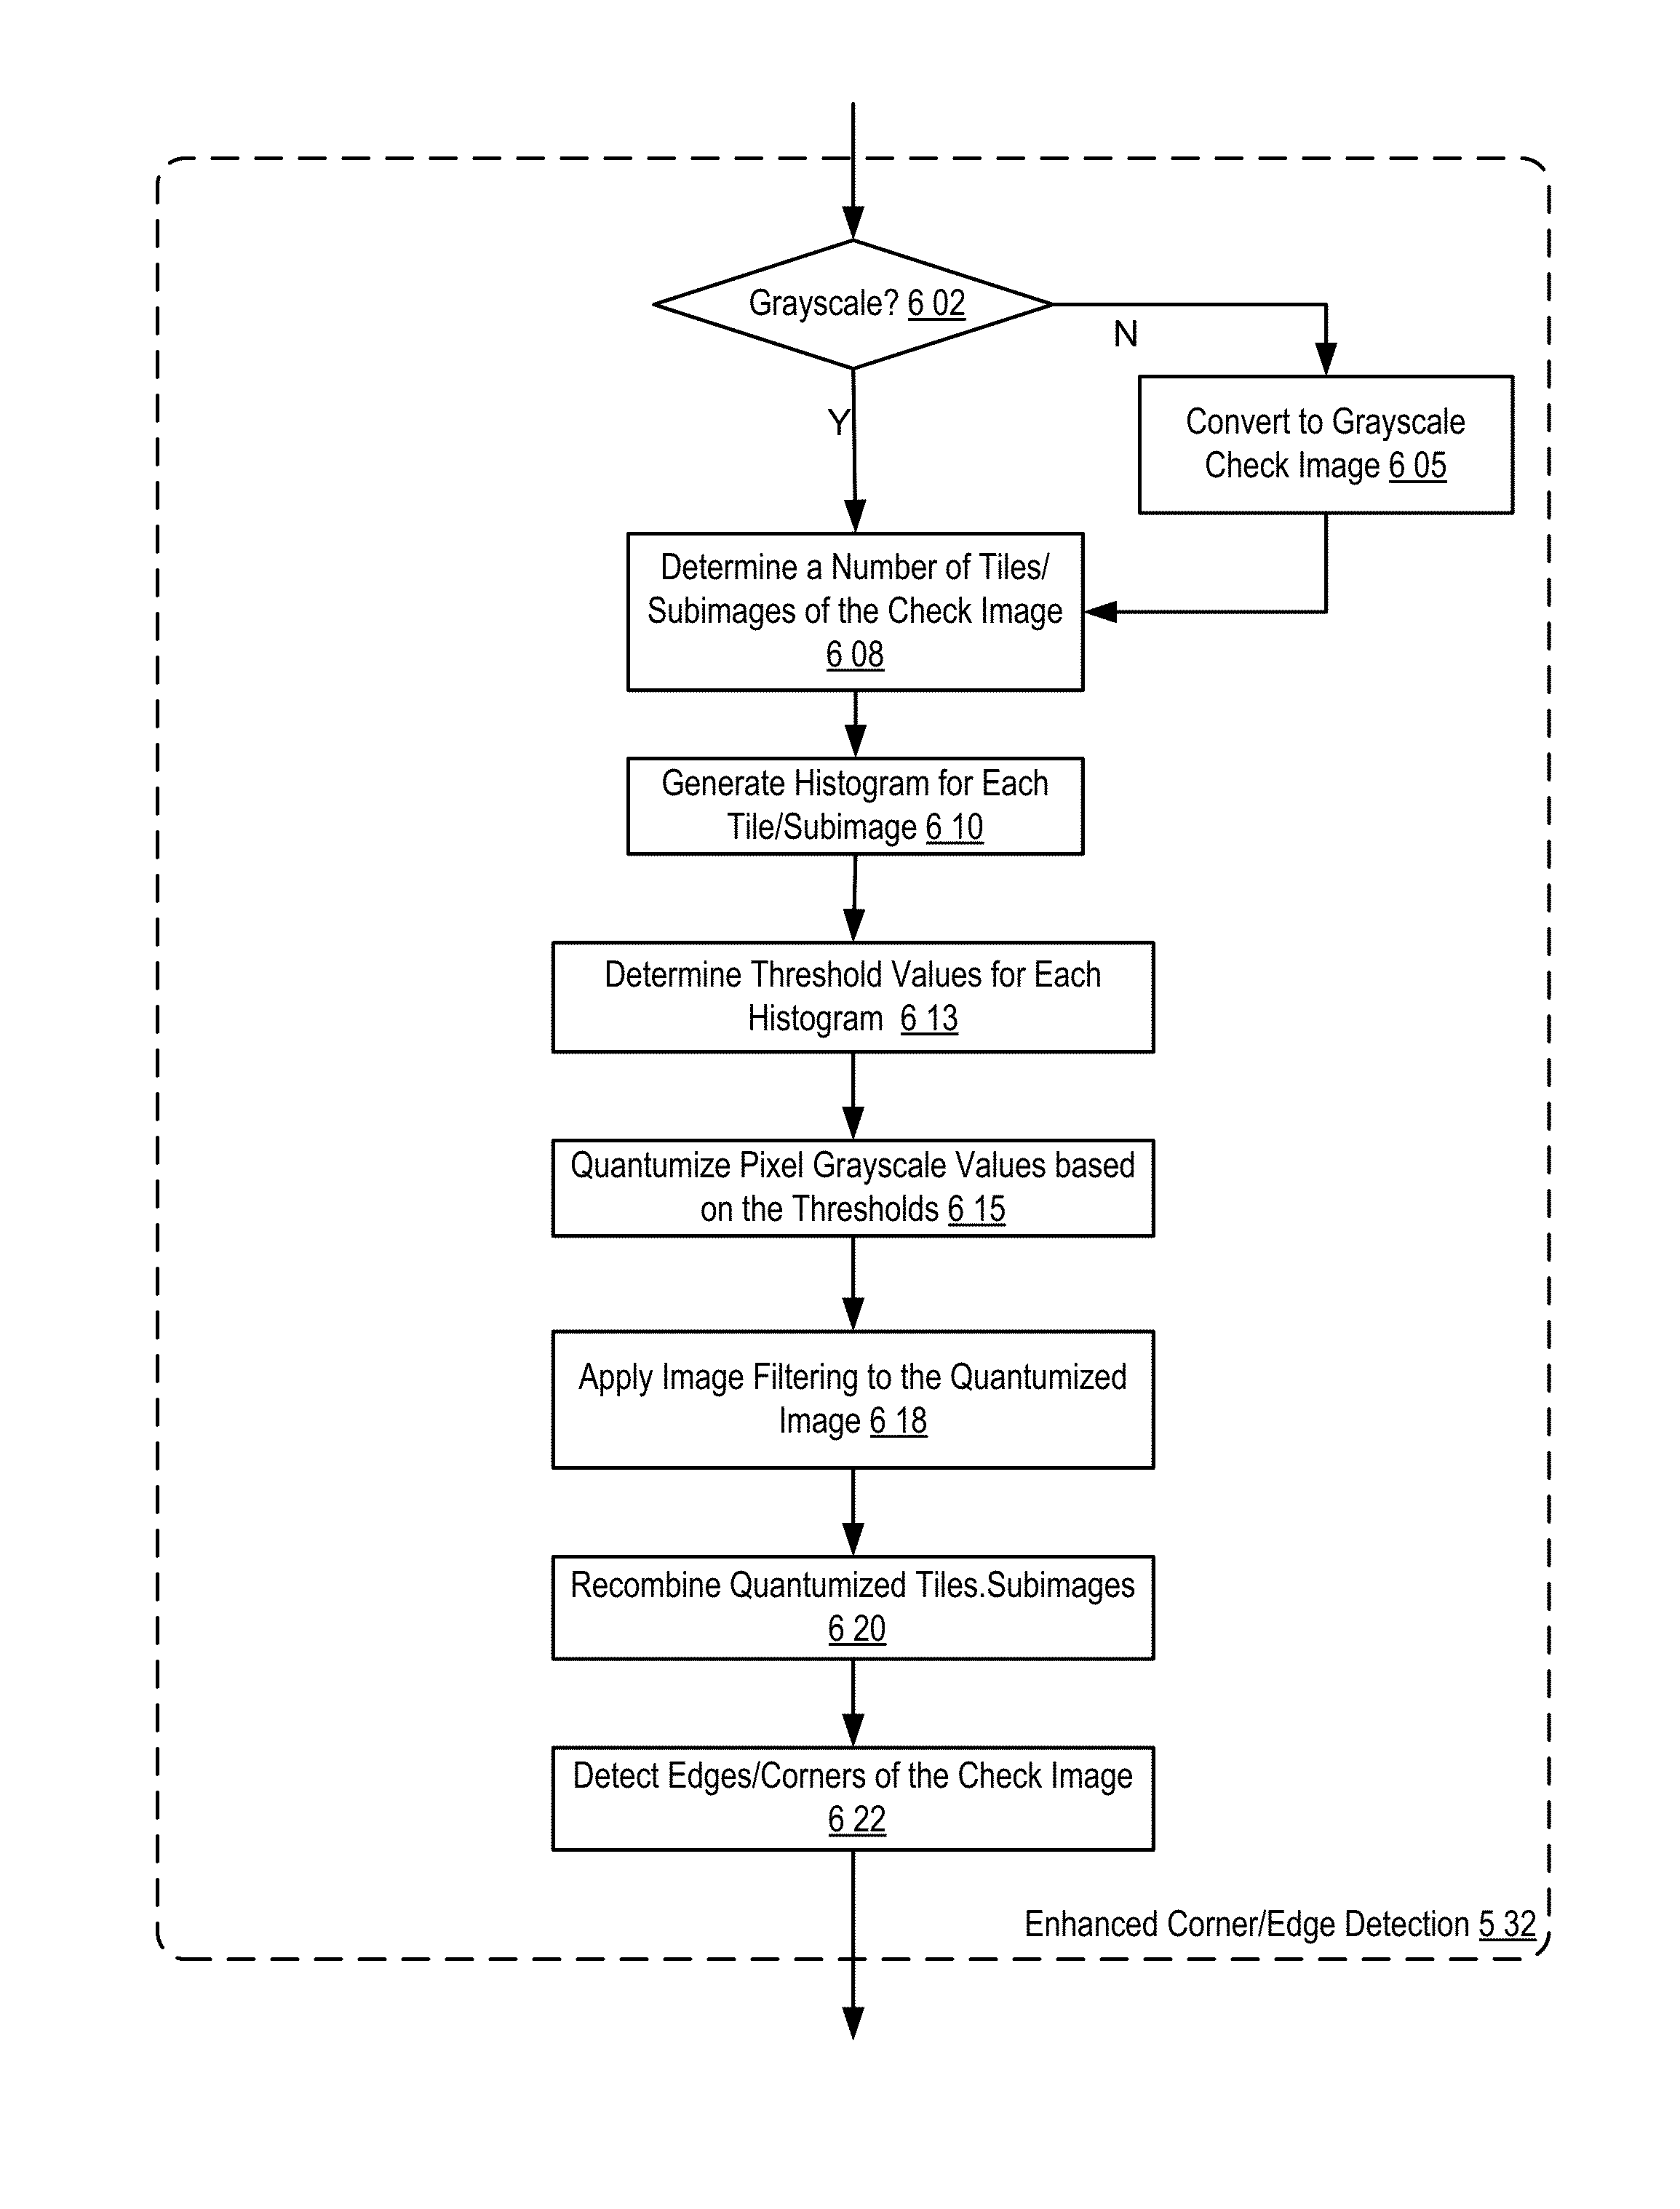 Patent US 9,129,340 B1 on